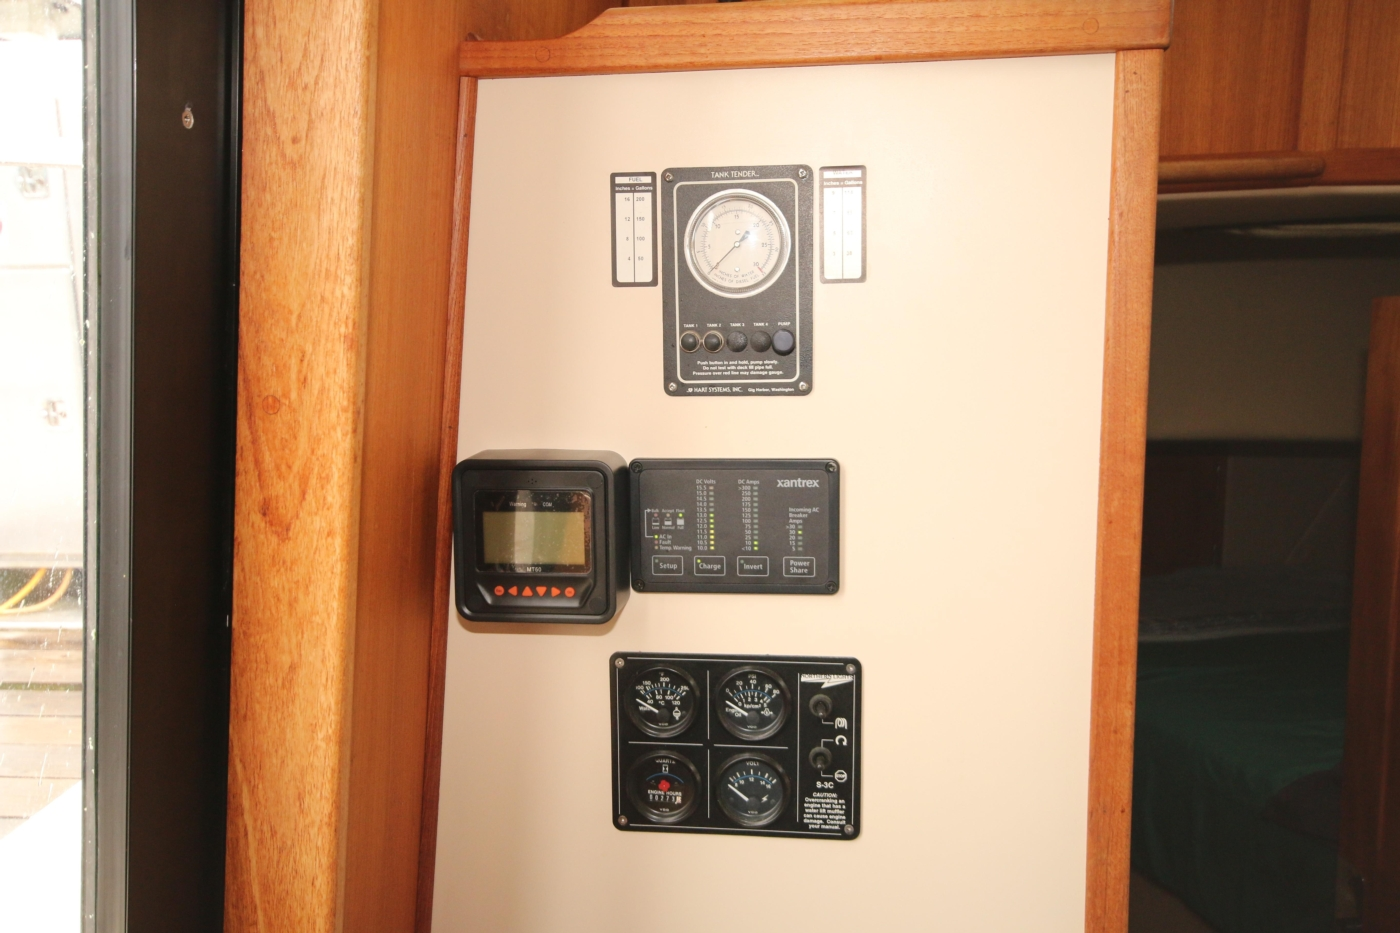 1999 Nordic Tugs 32, Solar, Inverter, Genset Controls